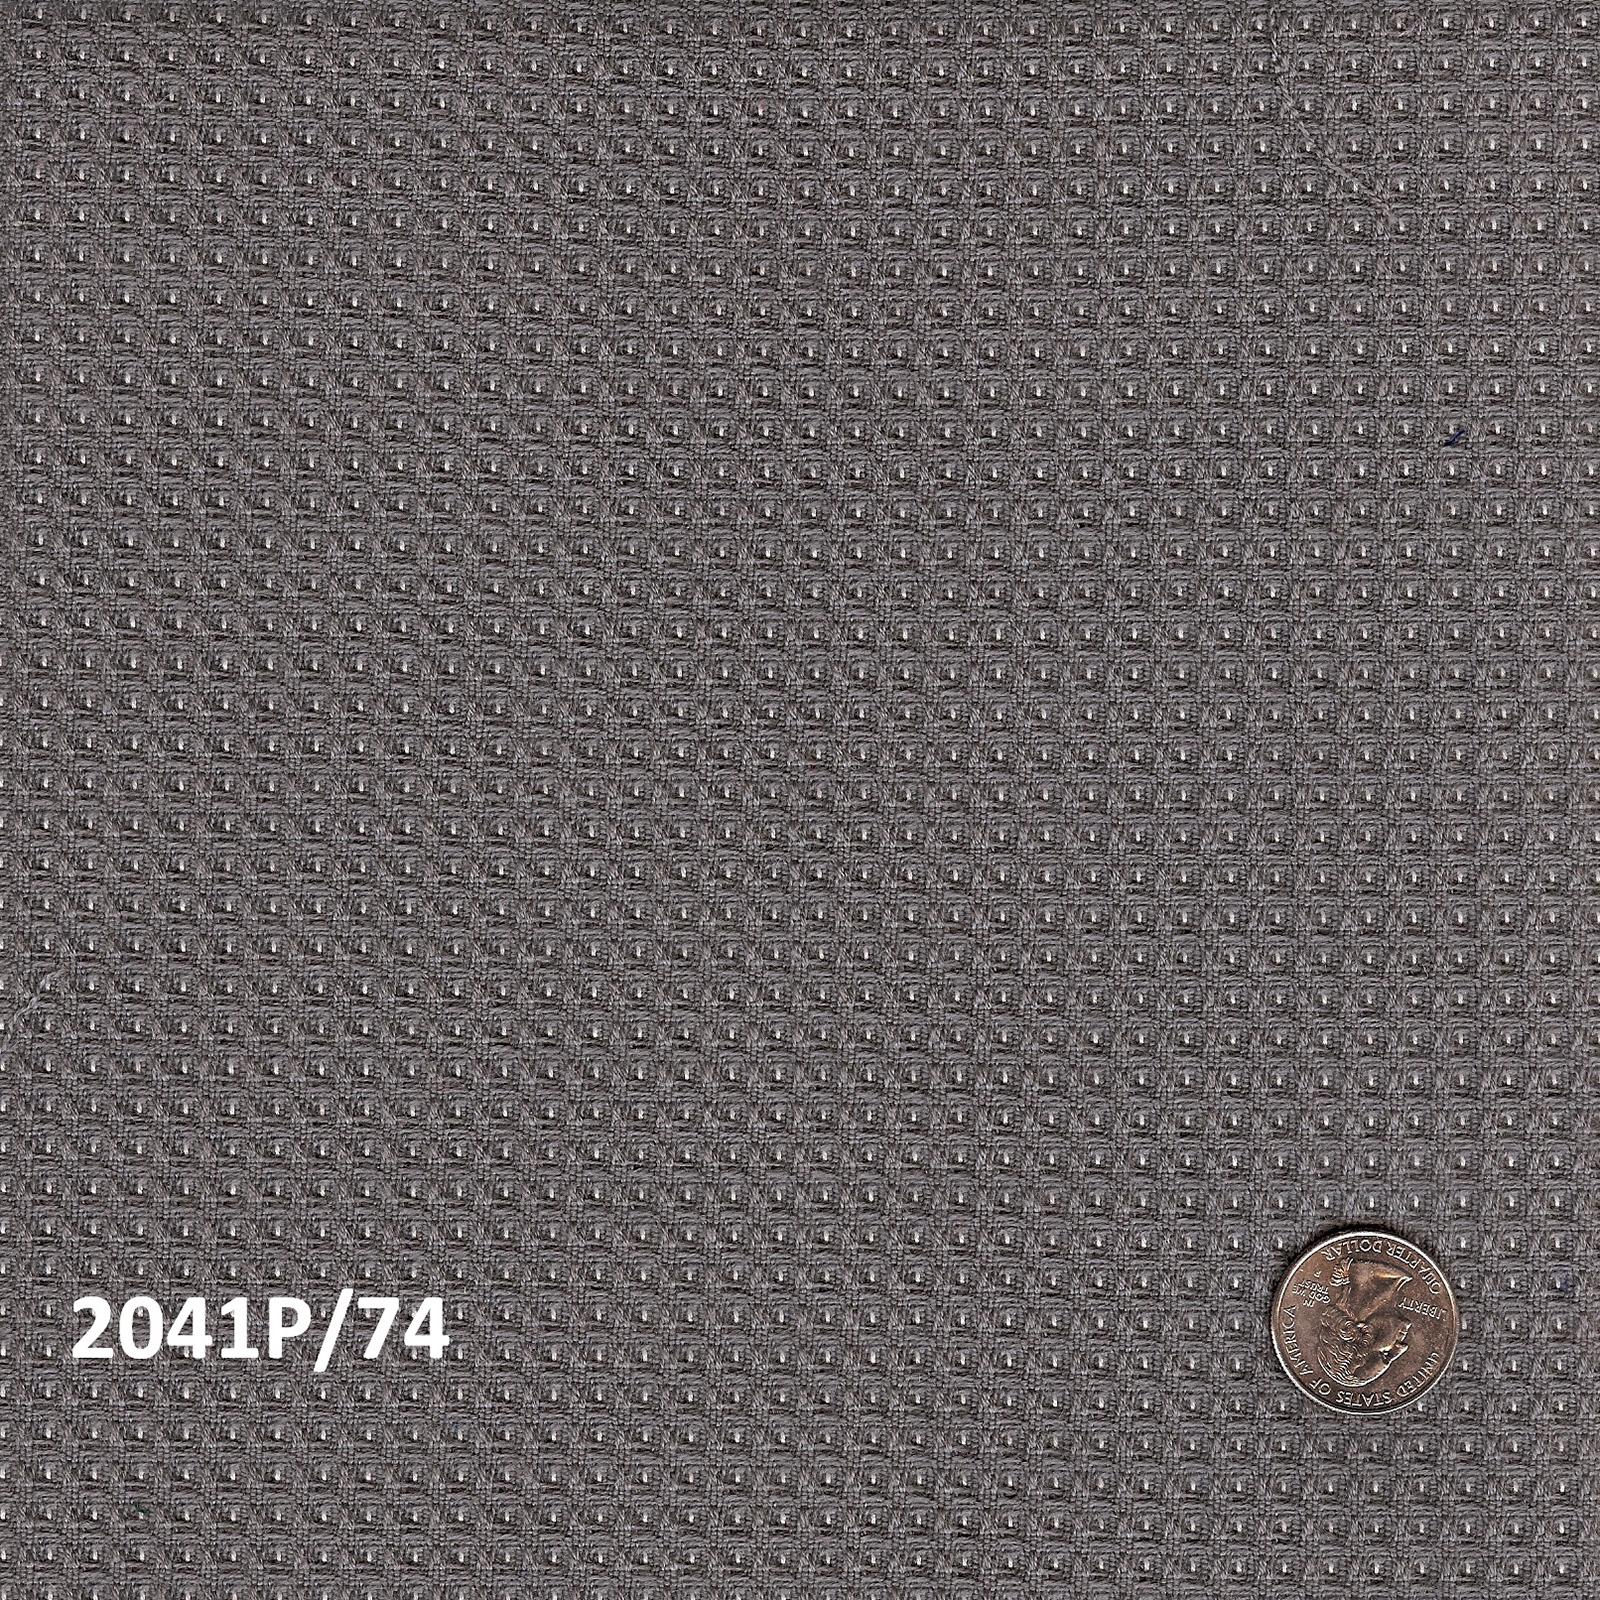 2041P/74